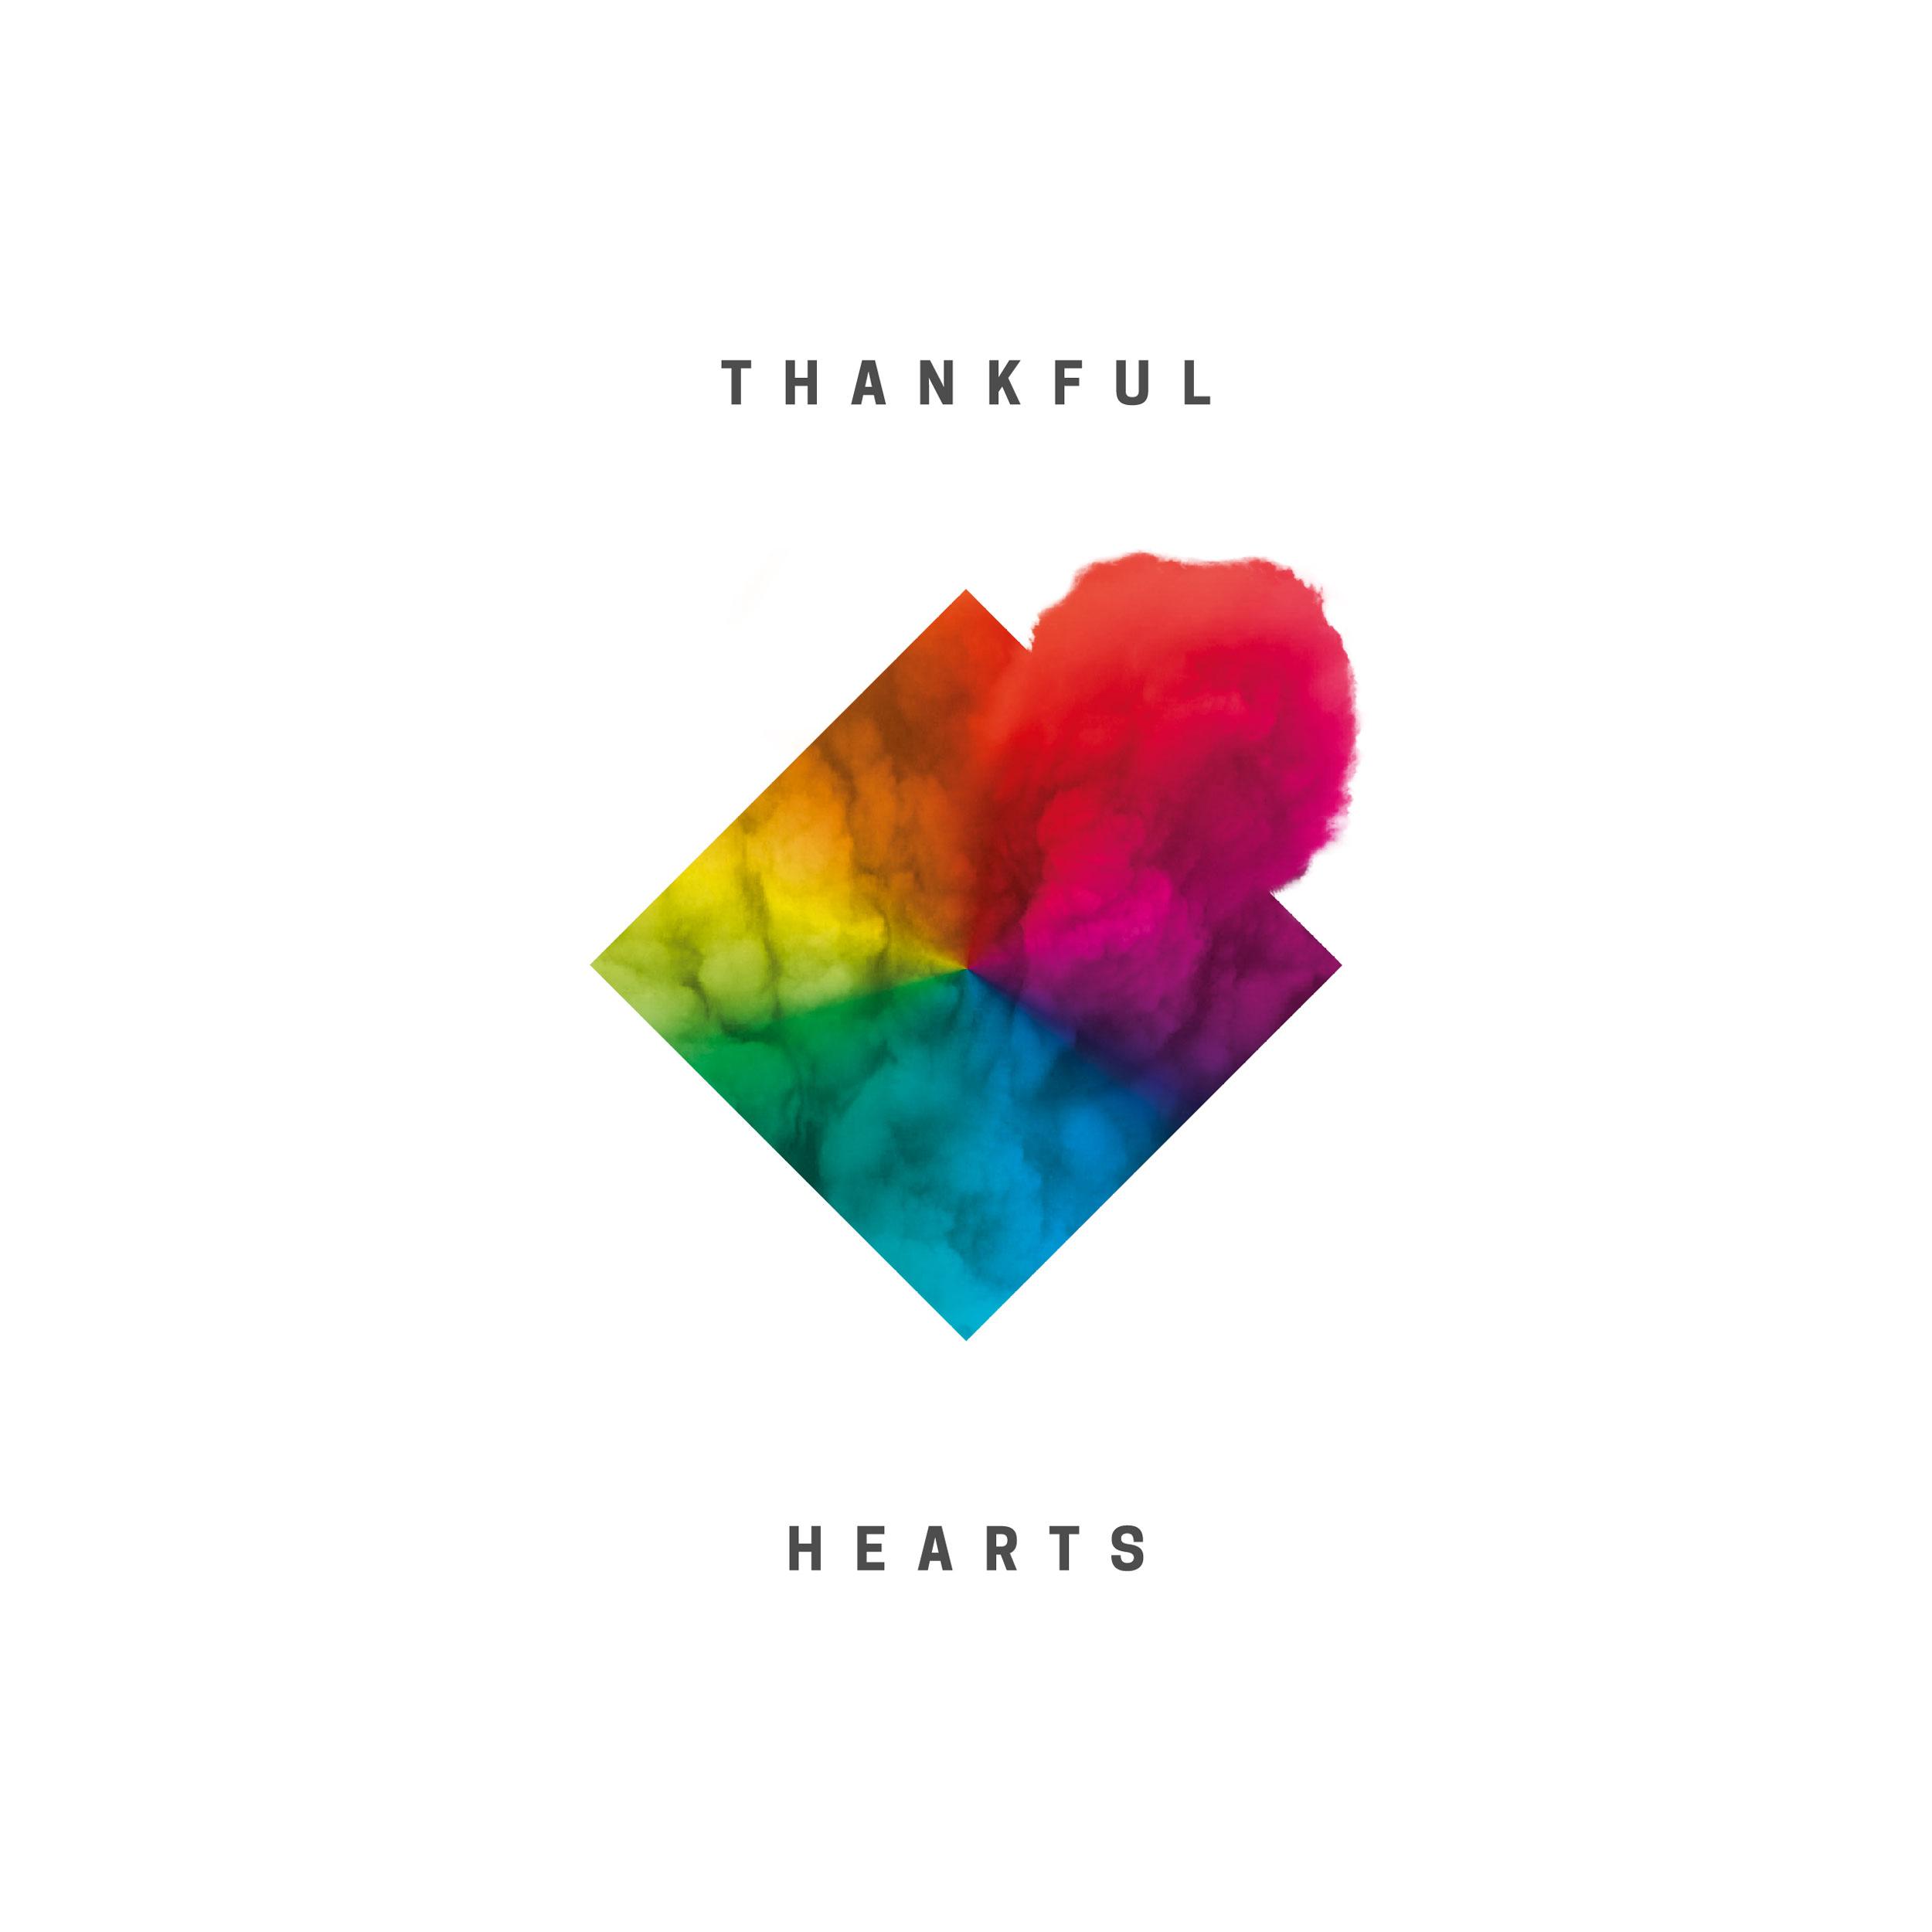 thankful_hearts_artwork_web.jpg